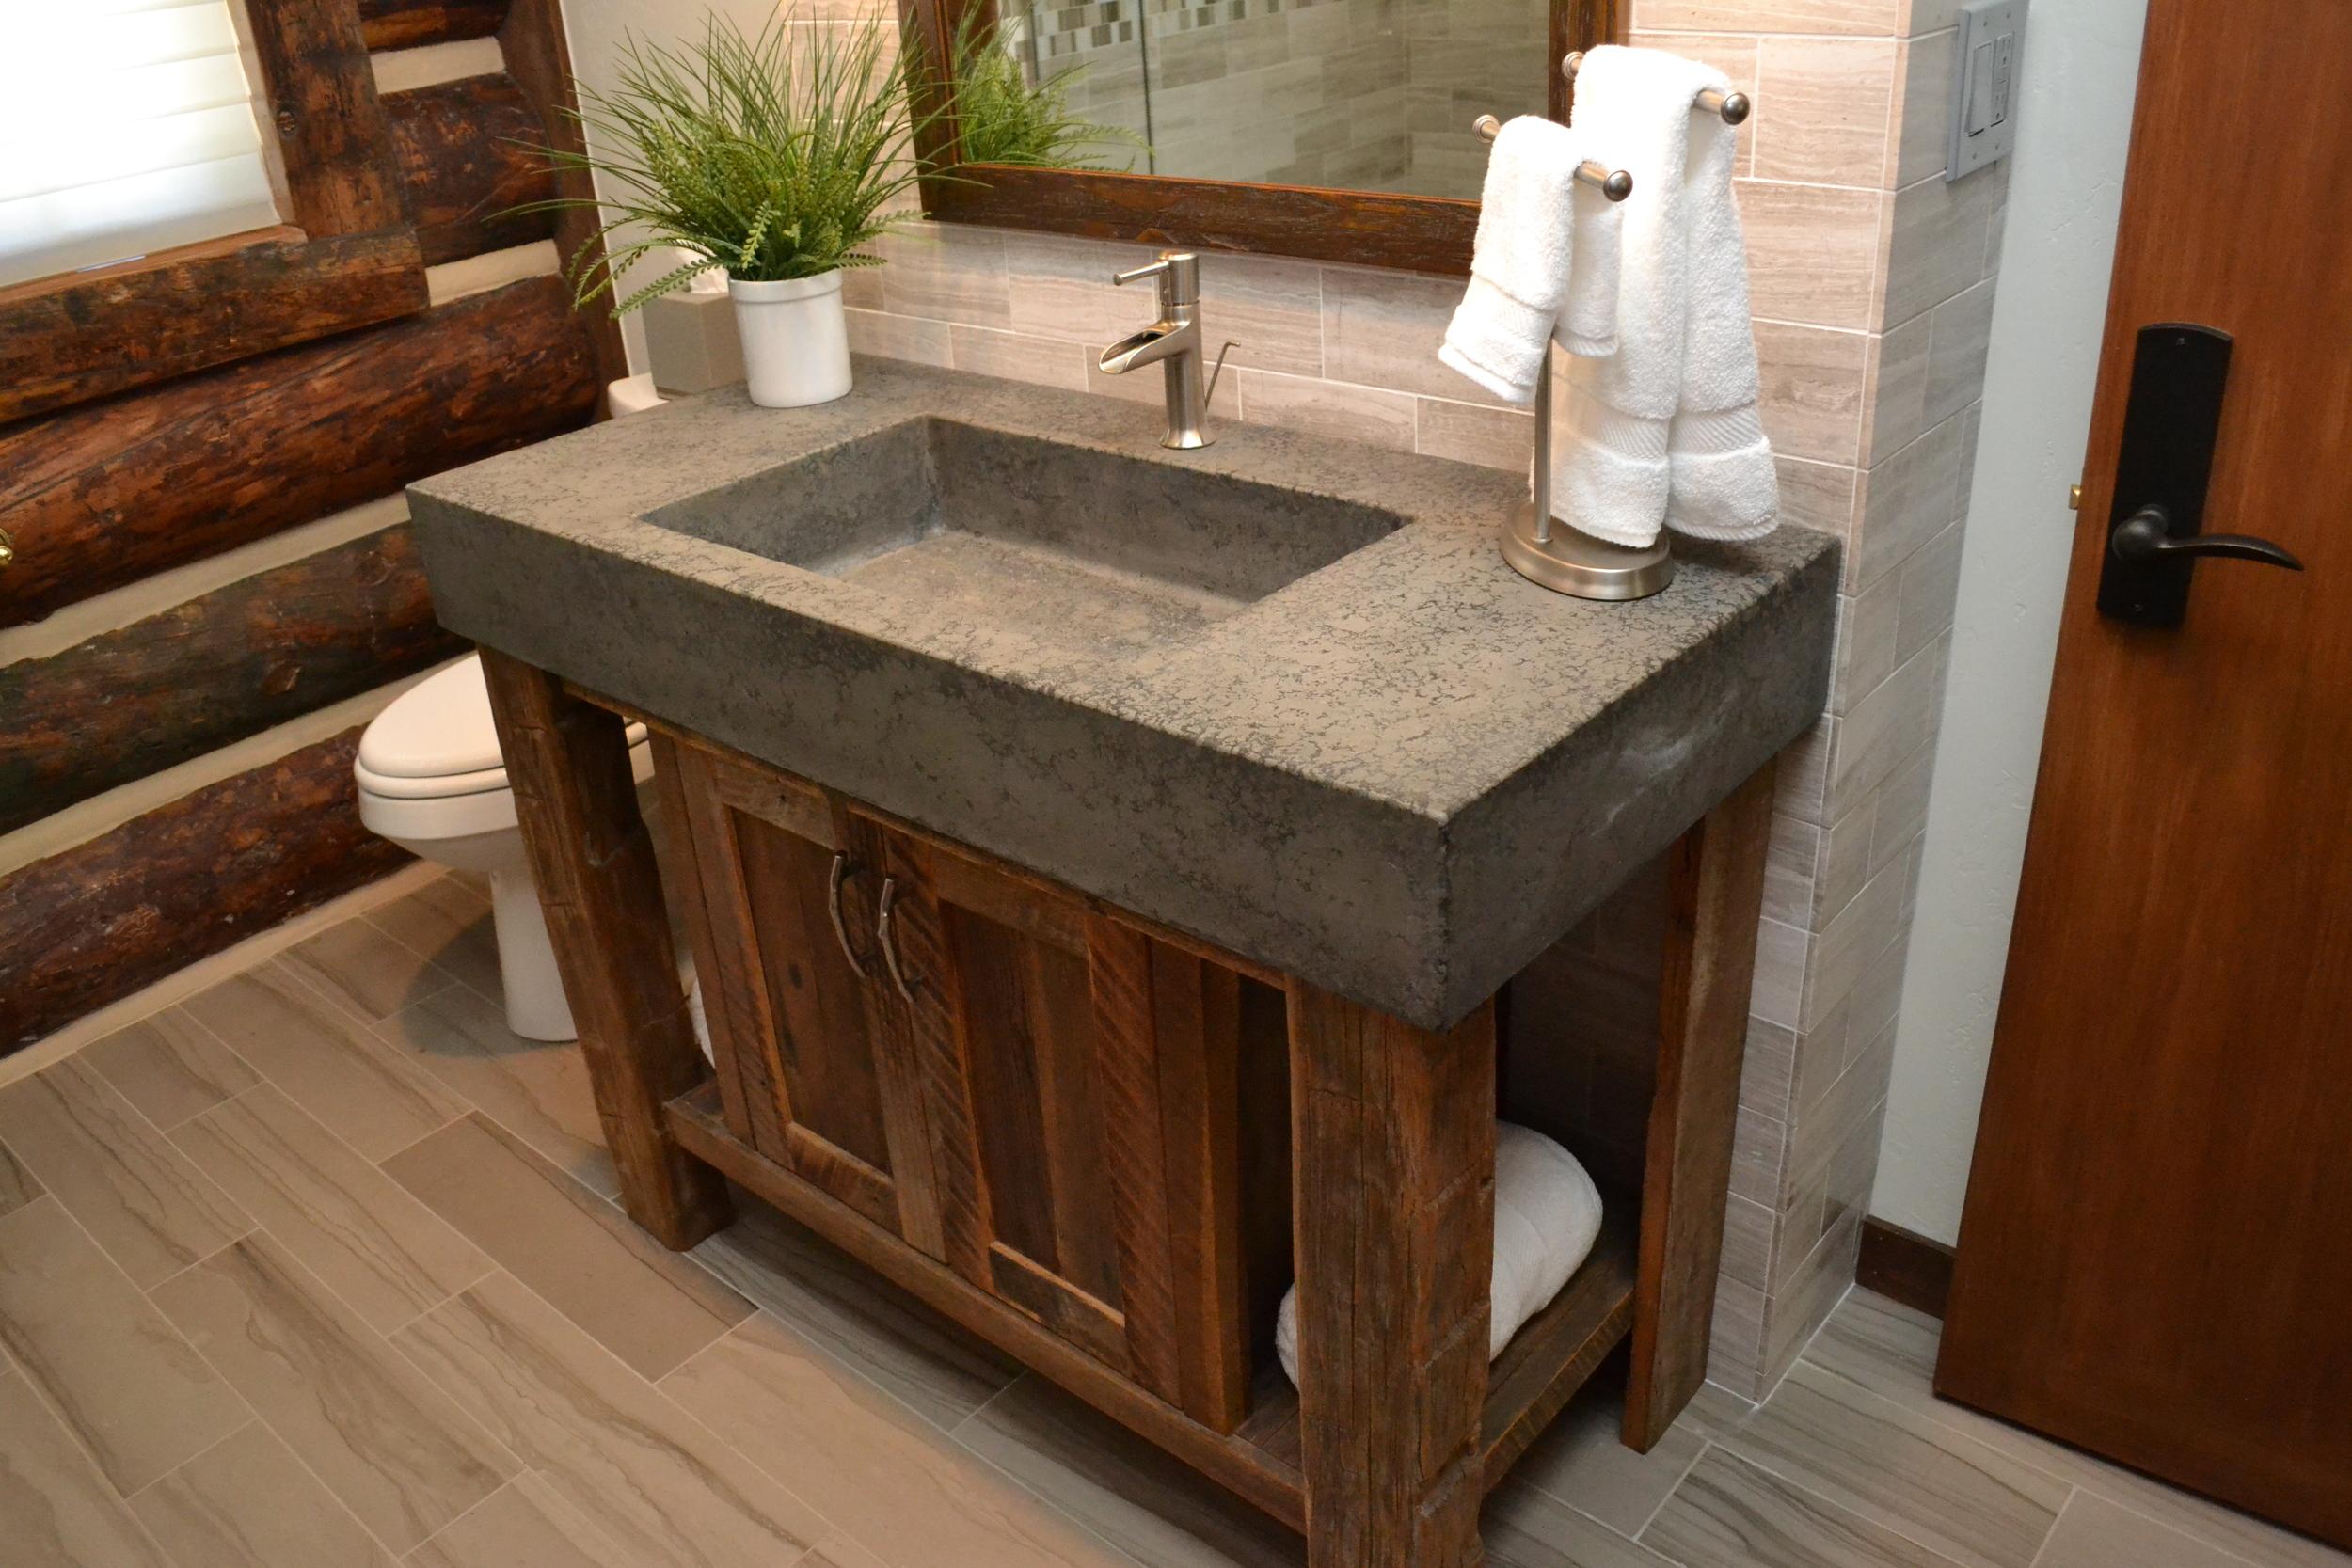 Custom concrete vessel sink in log home